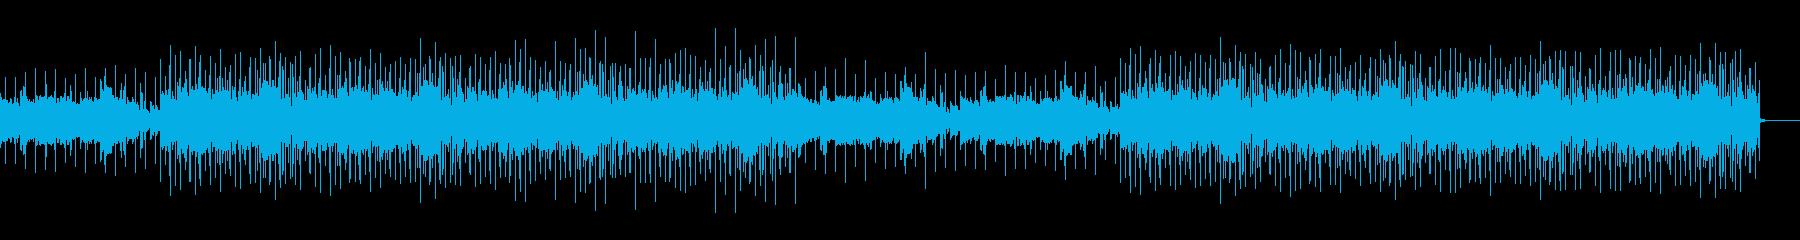 Lo-Fi チルアウト4の再生済みの波形